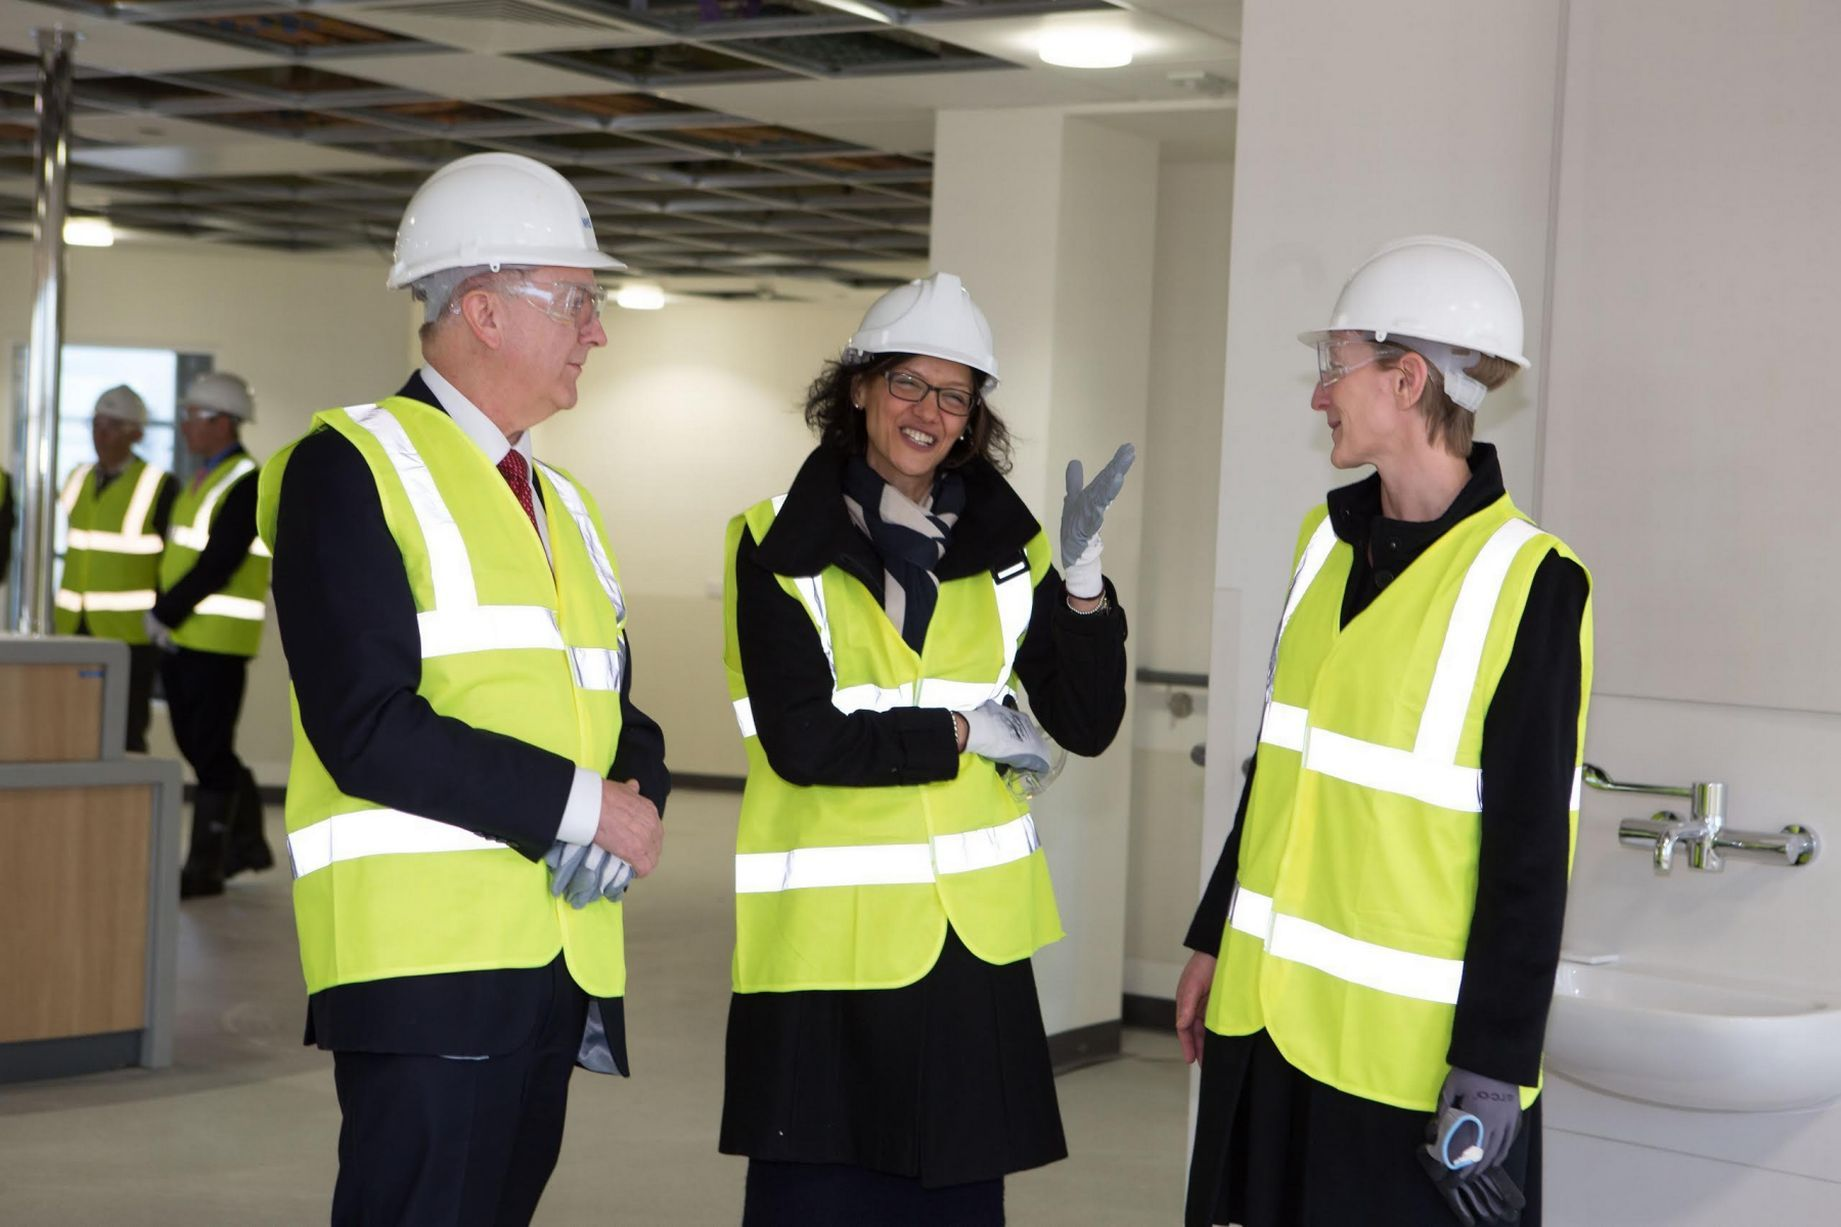 Nhs boss visits cramlingtons new multi million pound